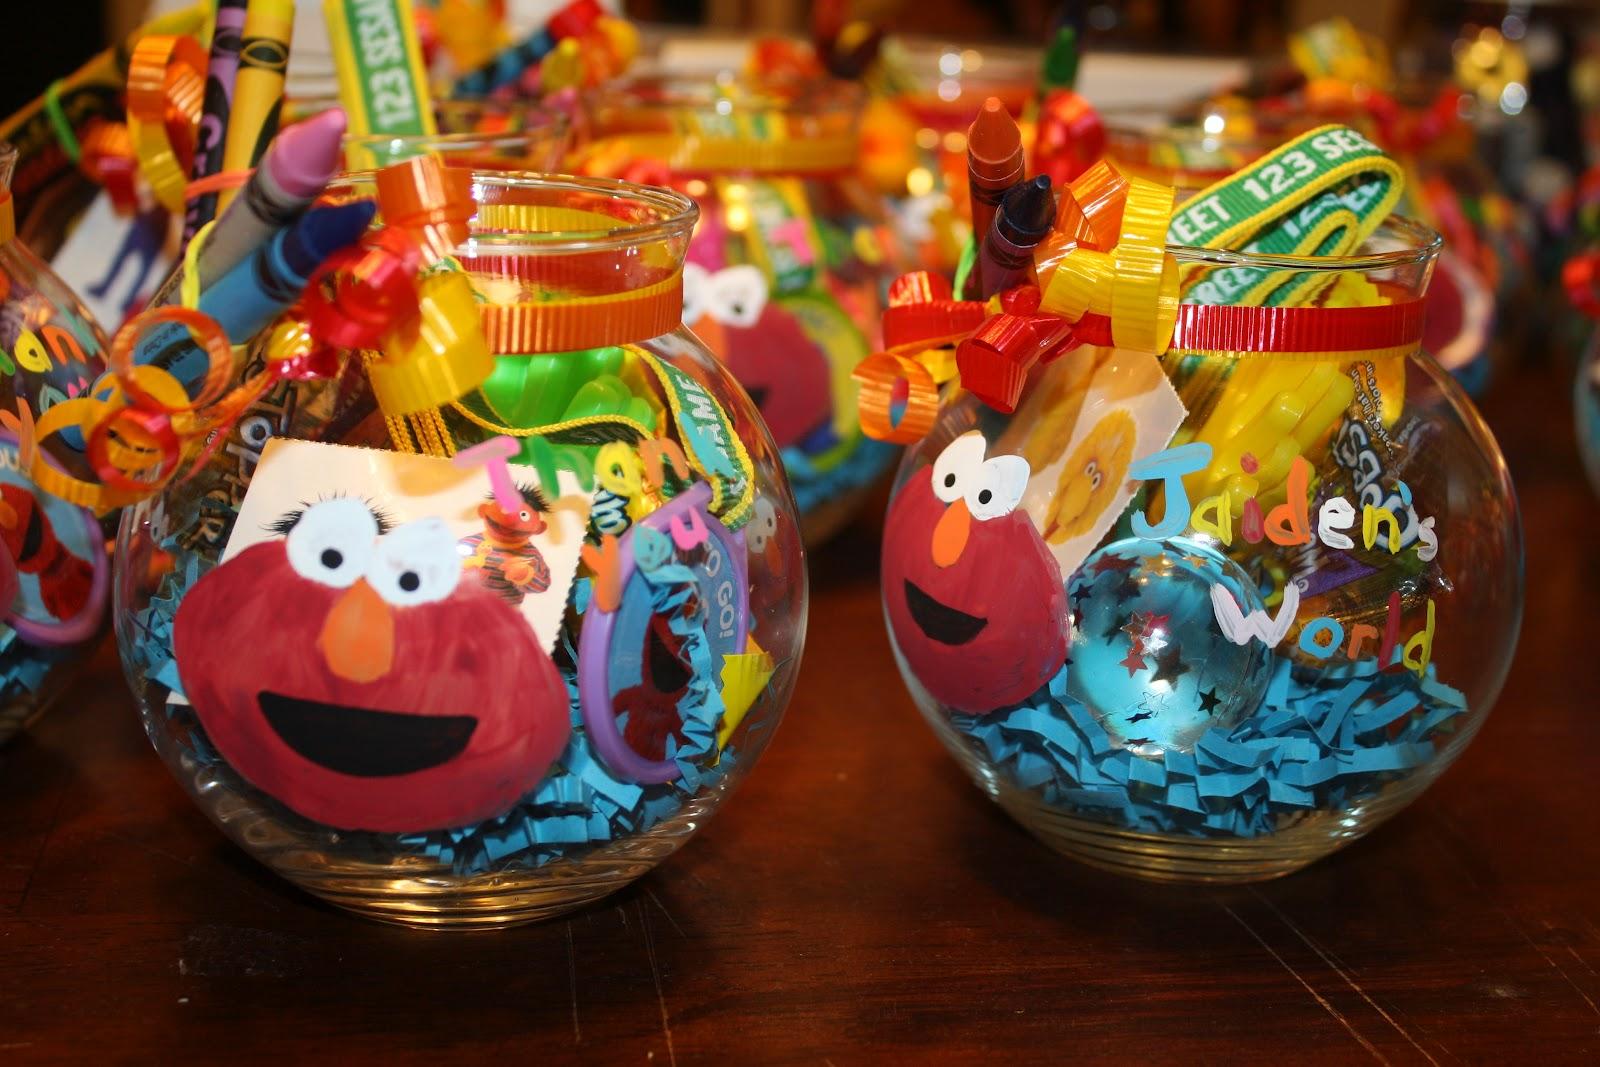 Elmo Birthday Decorations Image Inspiration of Cake and Birthday